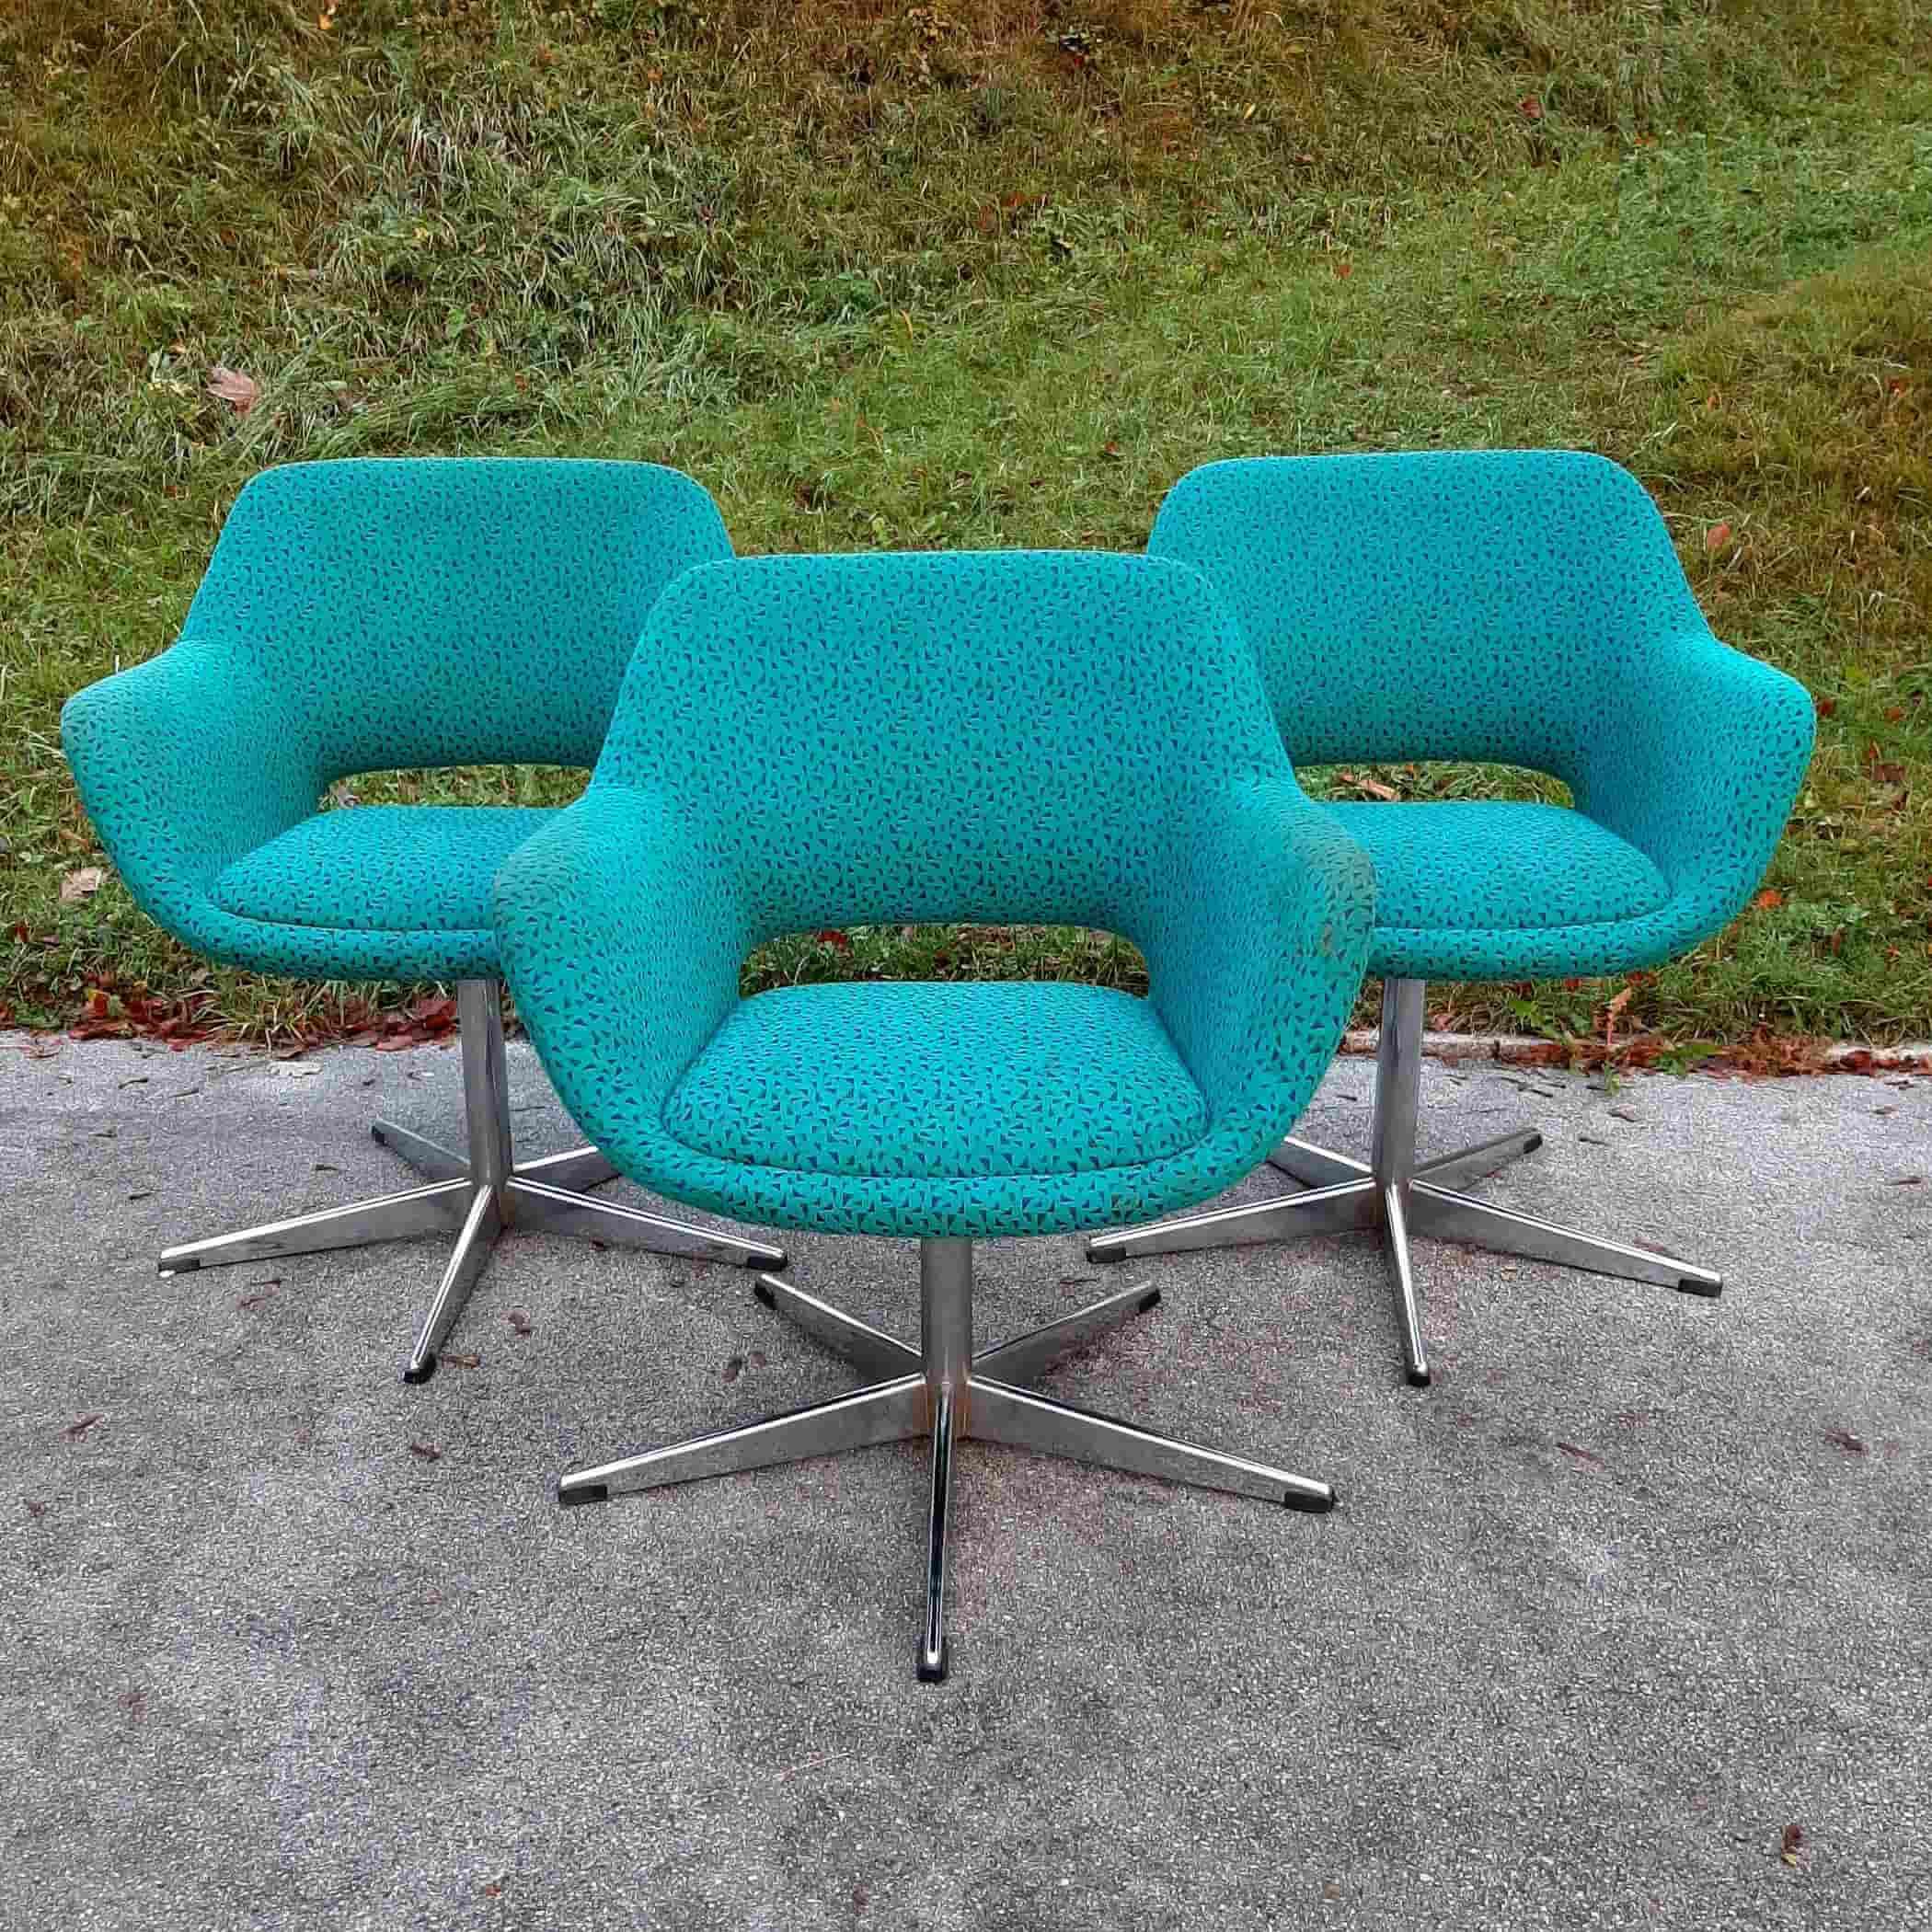 1 of 3 Mid-century office chair Stol Kamnik Yugoslavia 70s Retro desk chair Green Blue Original Textile Egg Chair Vintage Swivel Easy Chair